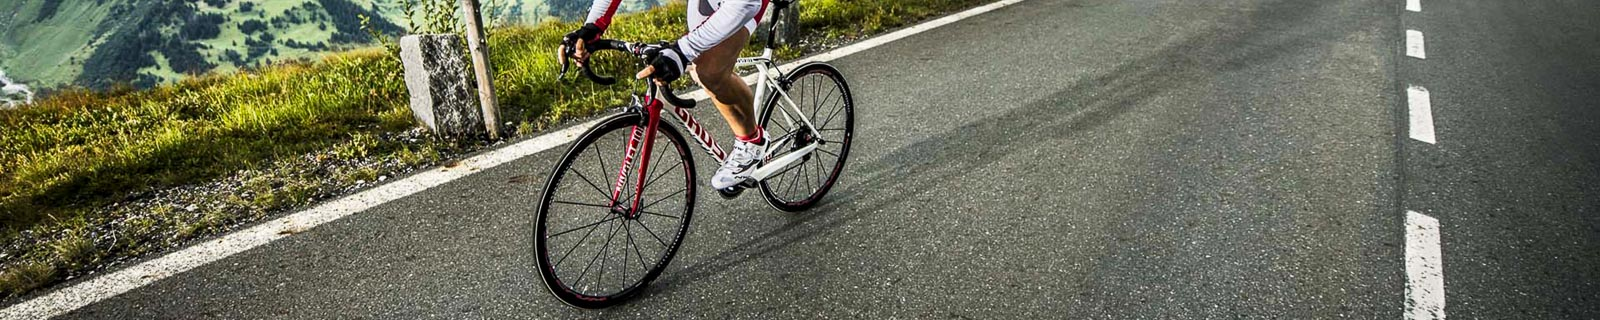 Bicicletas de carretera de aluminio para hombres